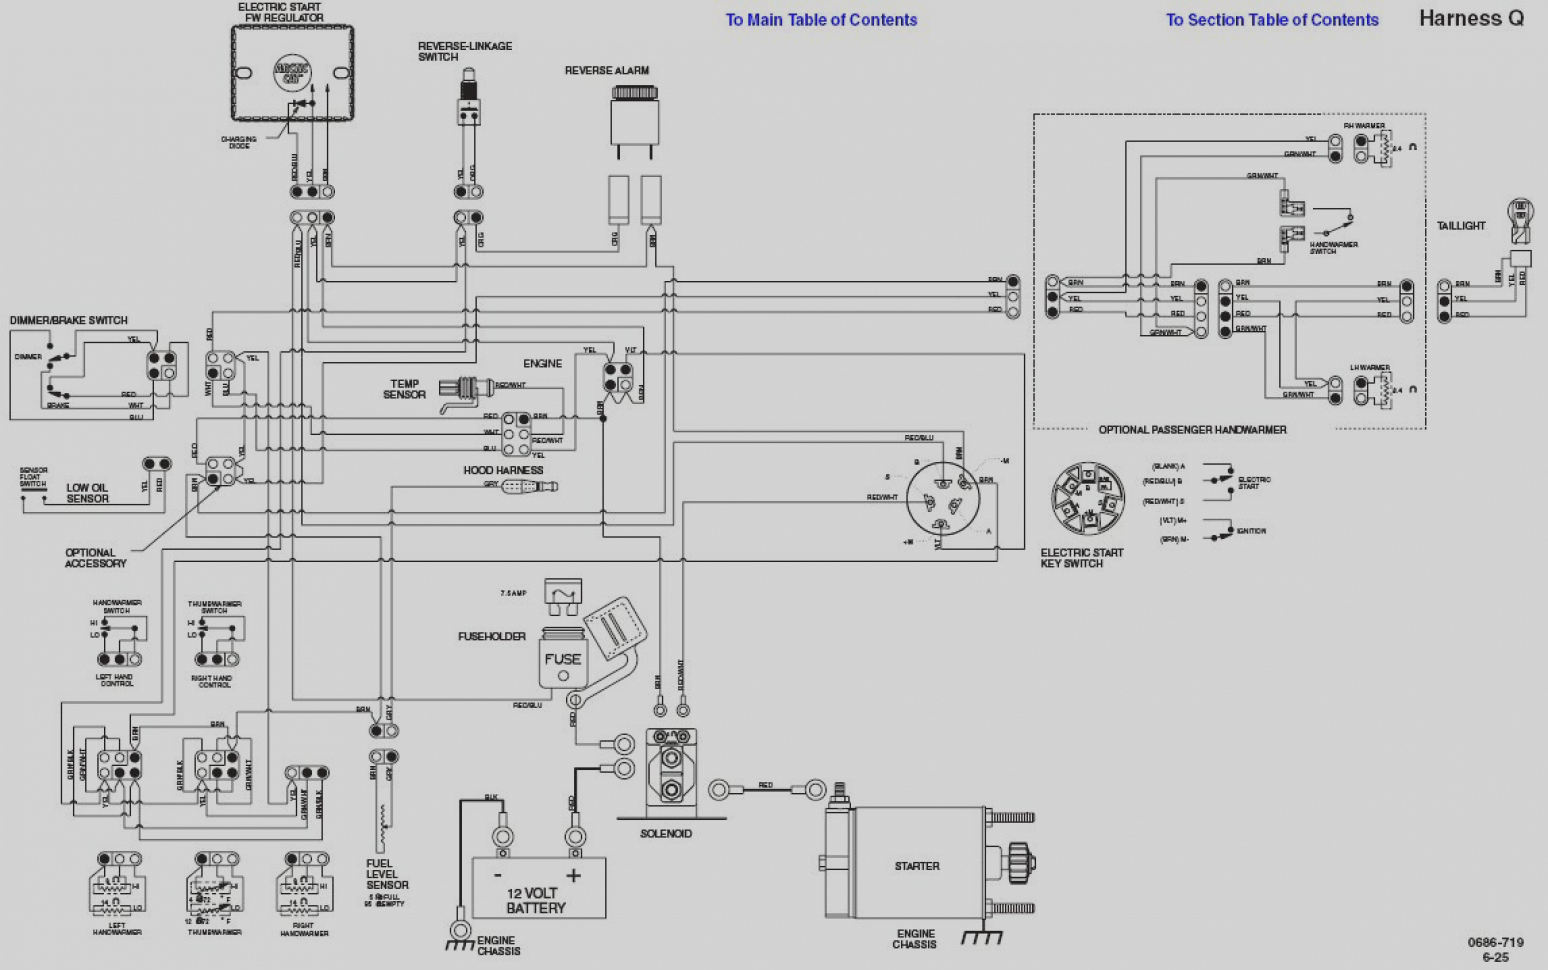 rzr 900 xp wiring diagram